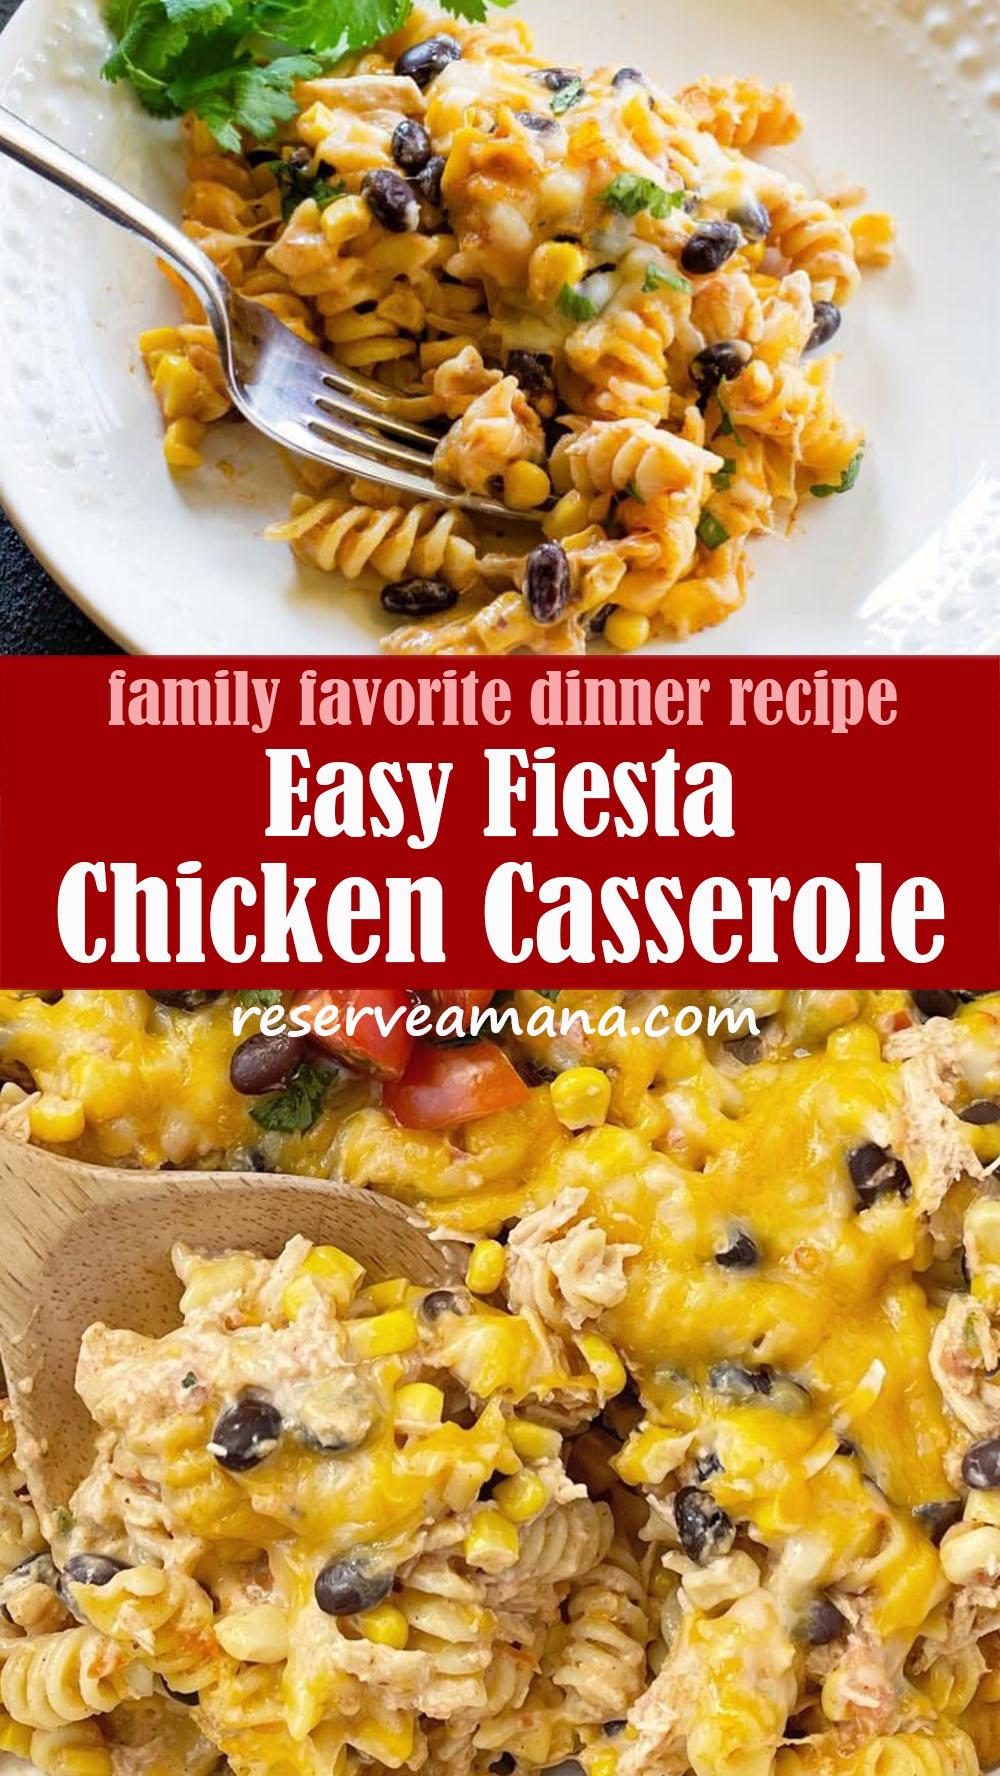 Easy Fiesta Chicken Casserole